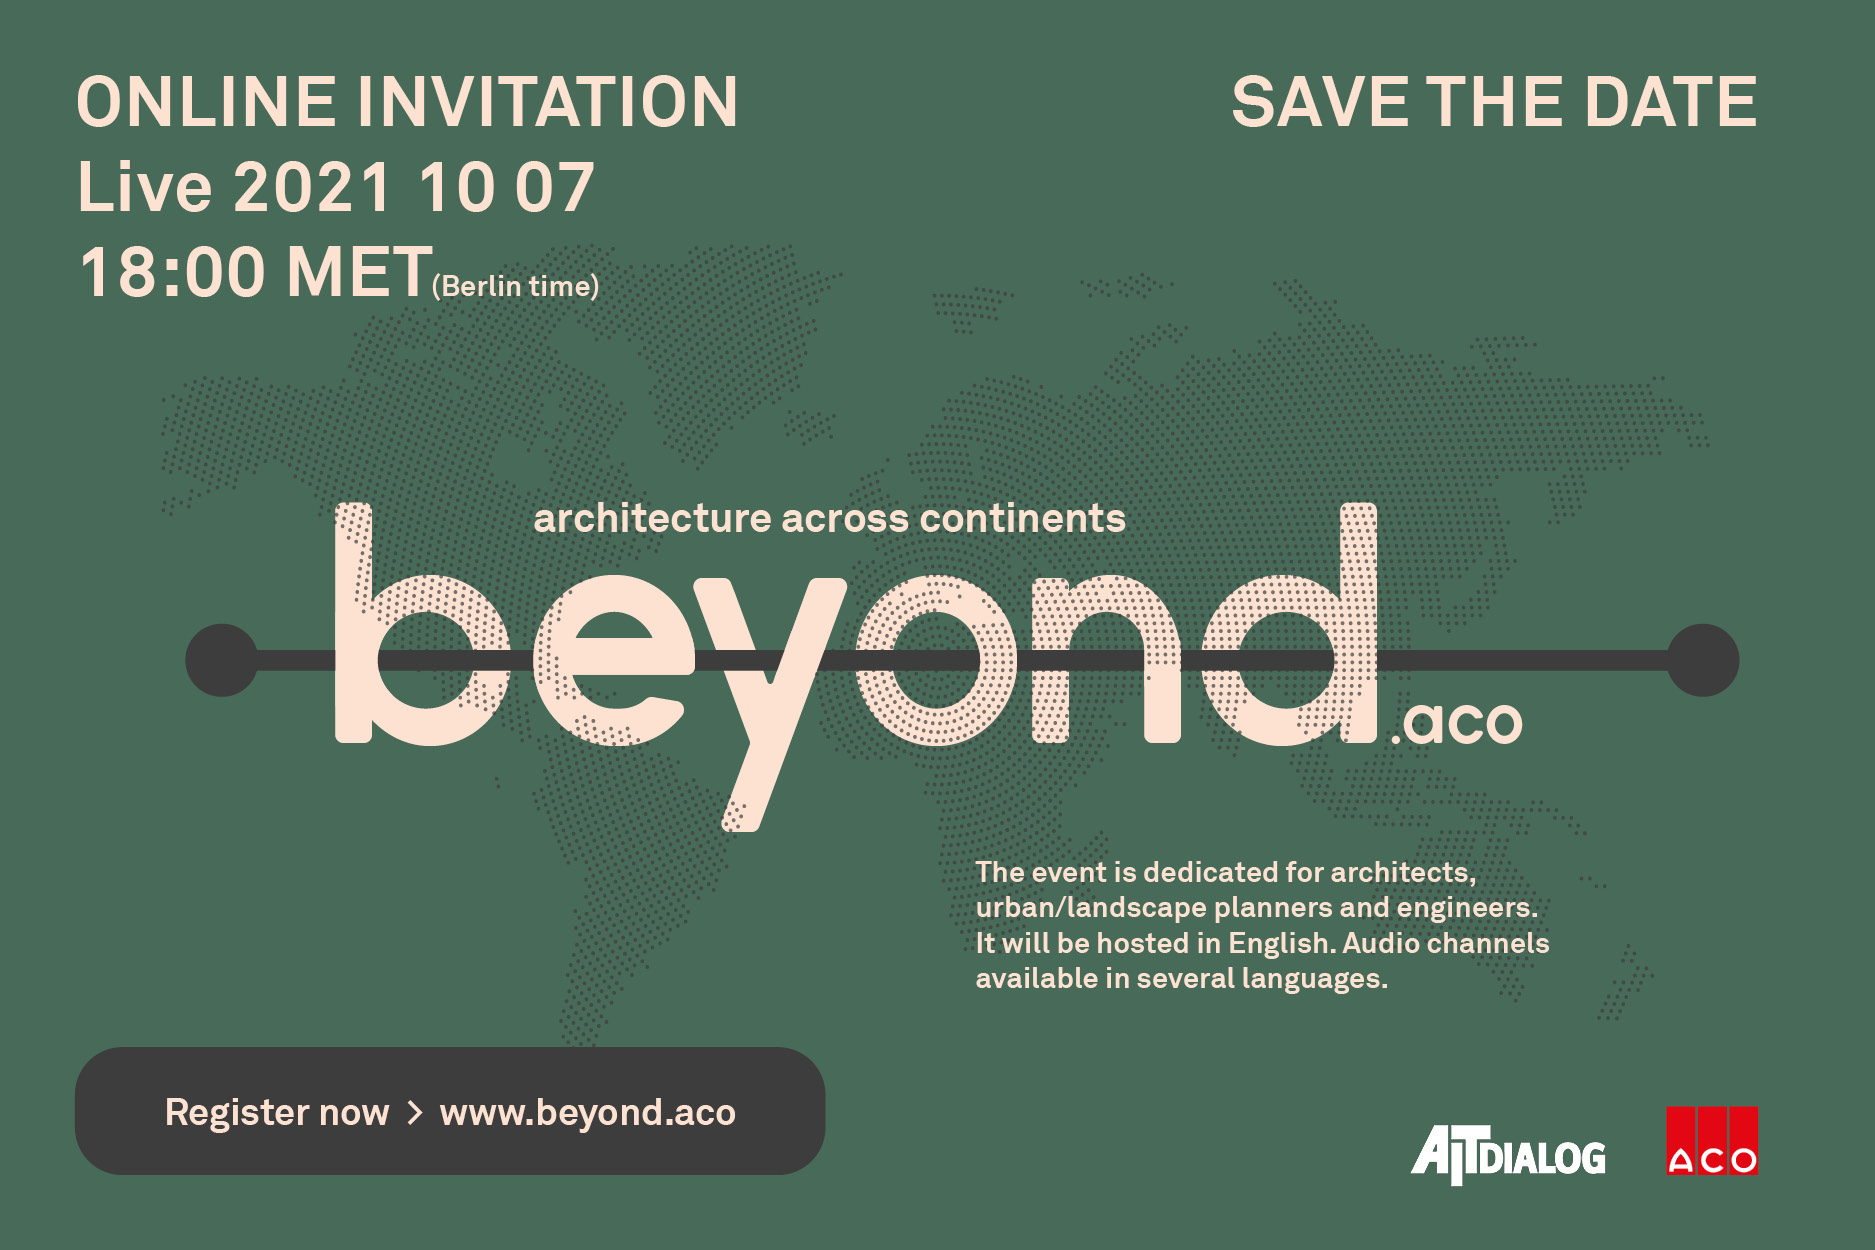 beyond.aco | 7. Oktober 2021